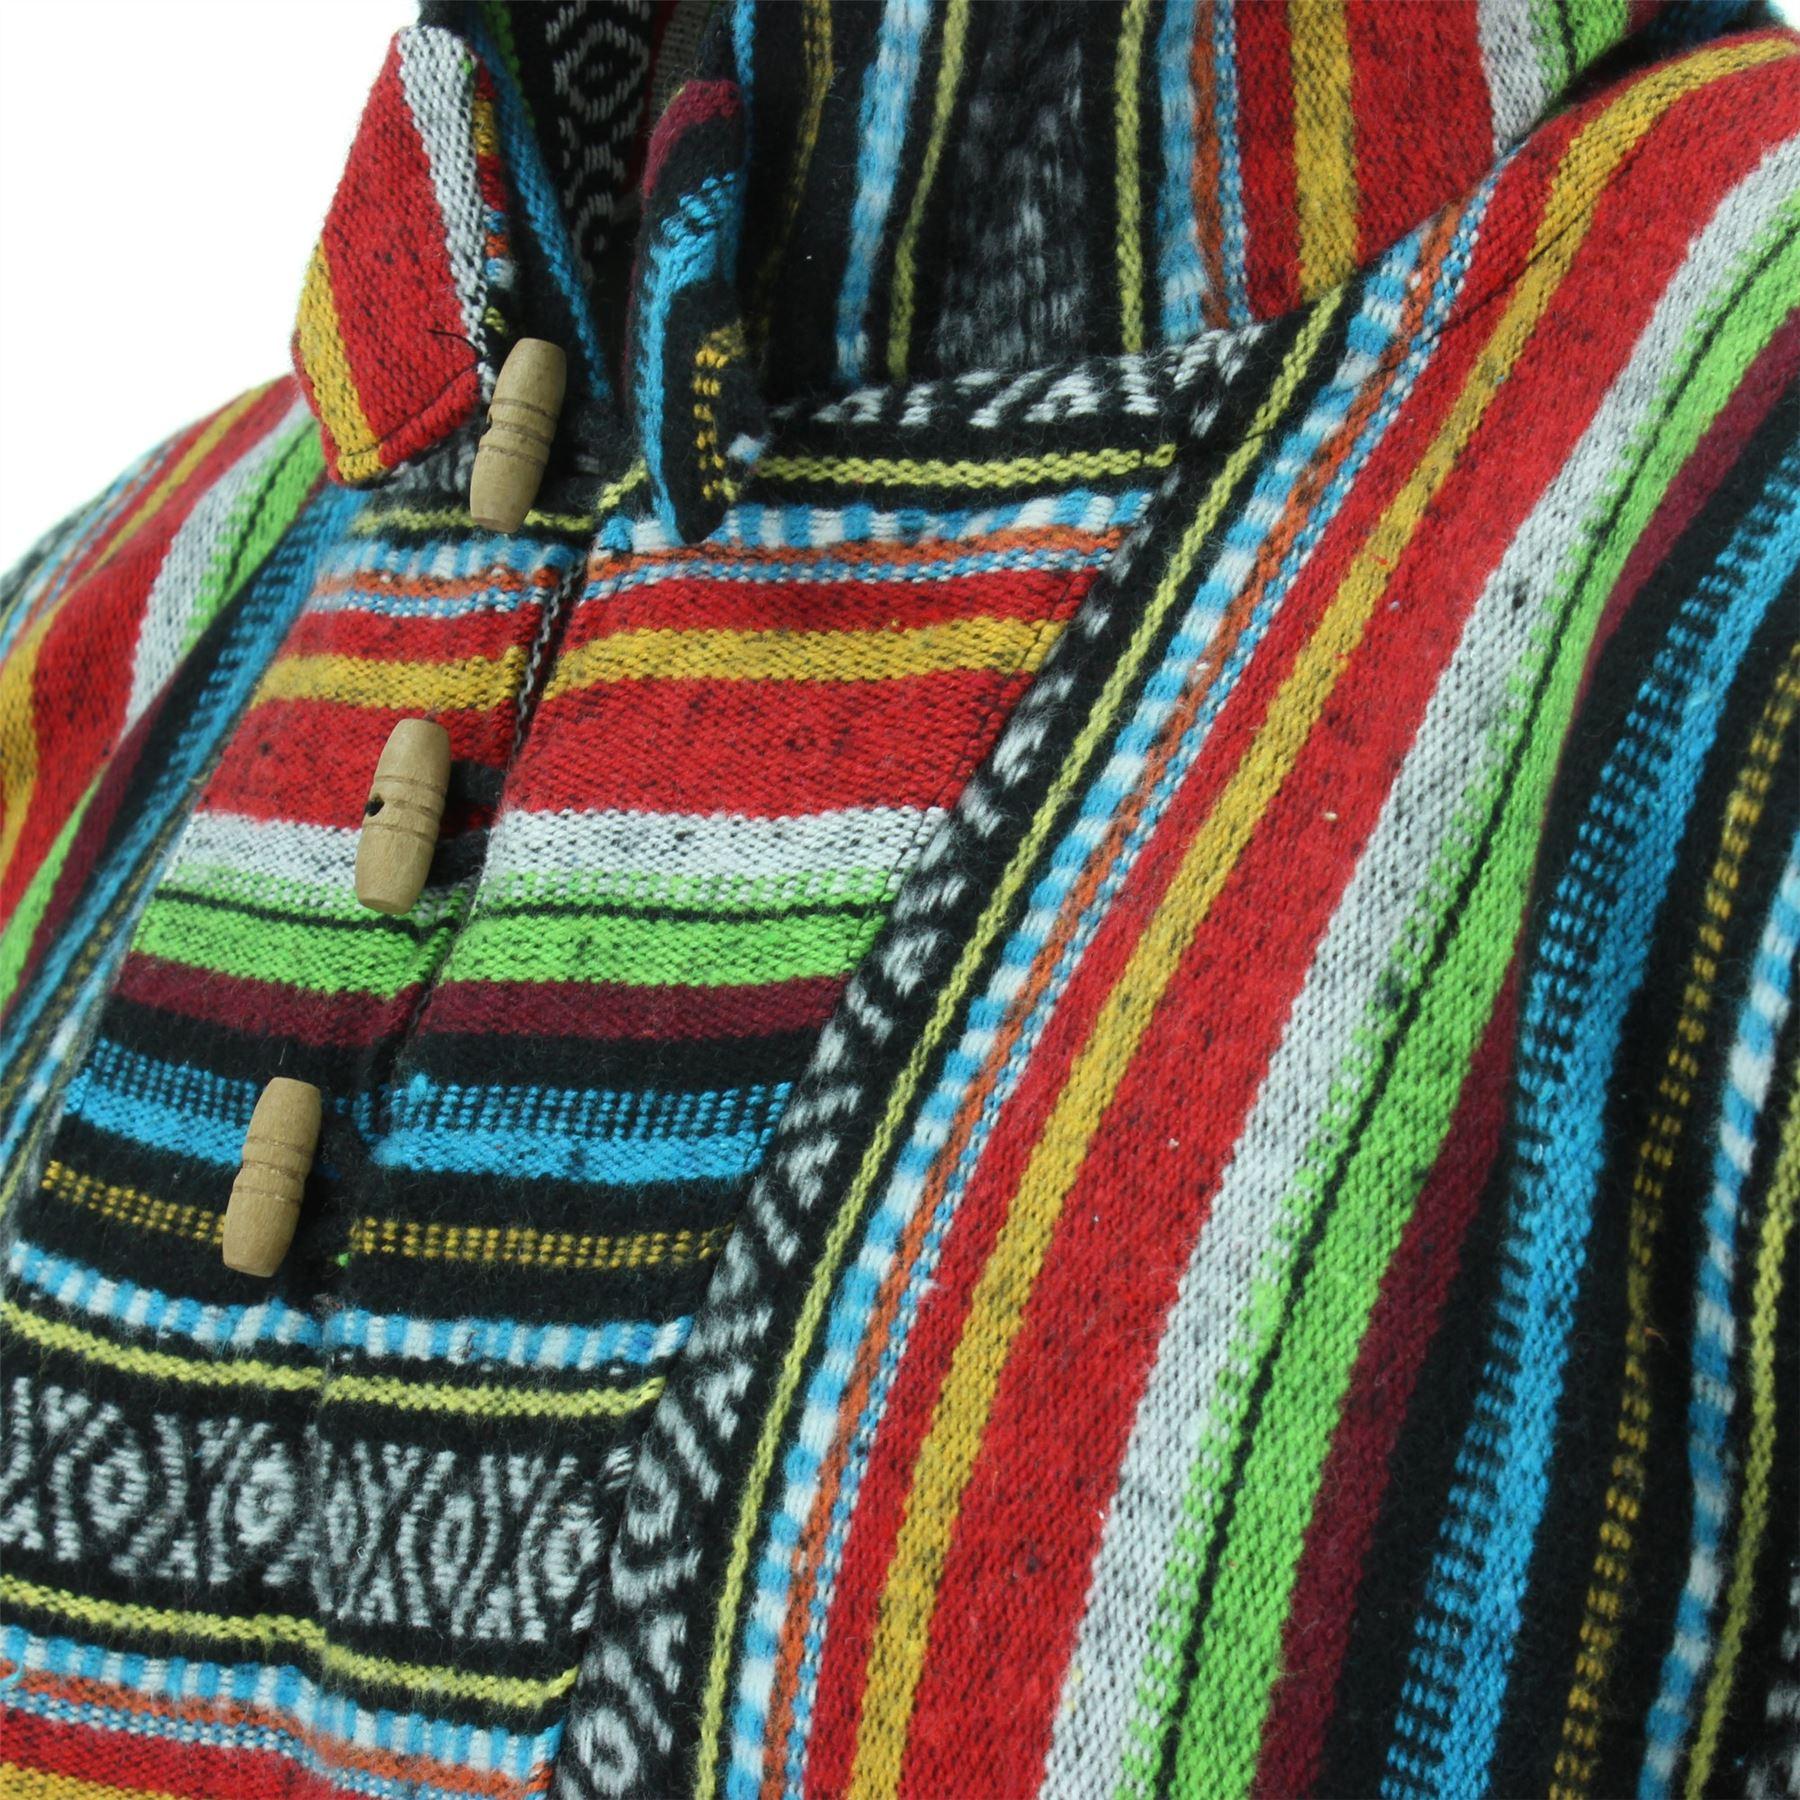 Poncho-Hooded-Cape-Cotton-Warm-Festival-Long-Woven-Rainbow-Men-Women thumbnail 9